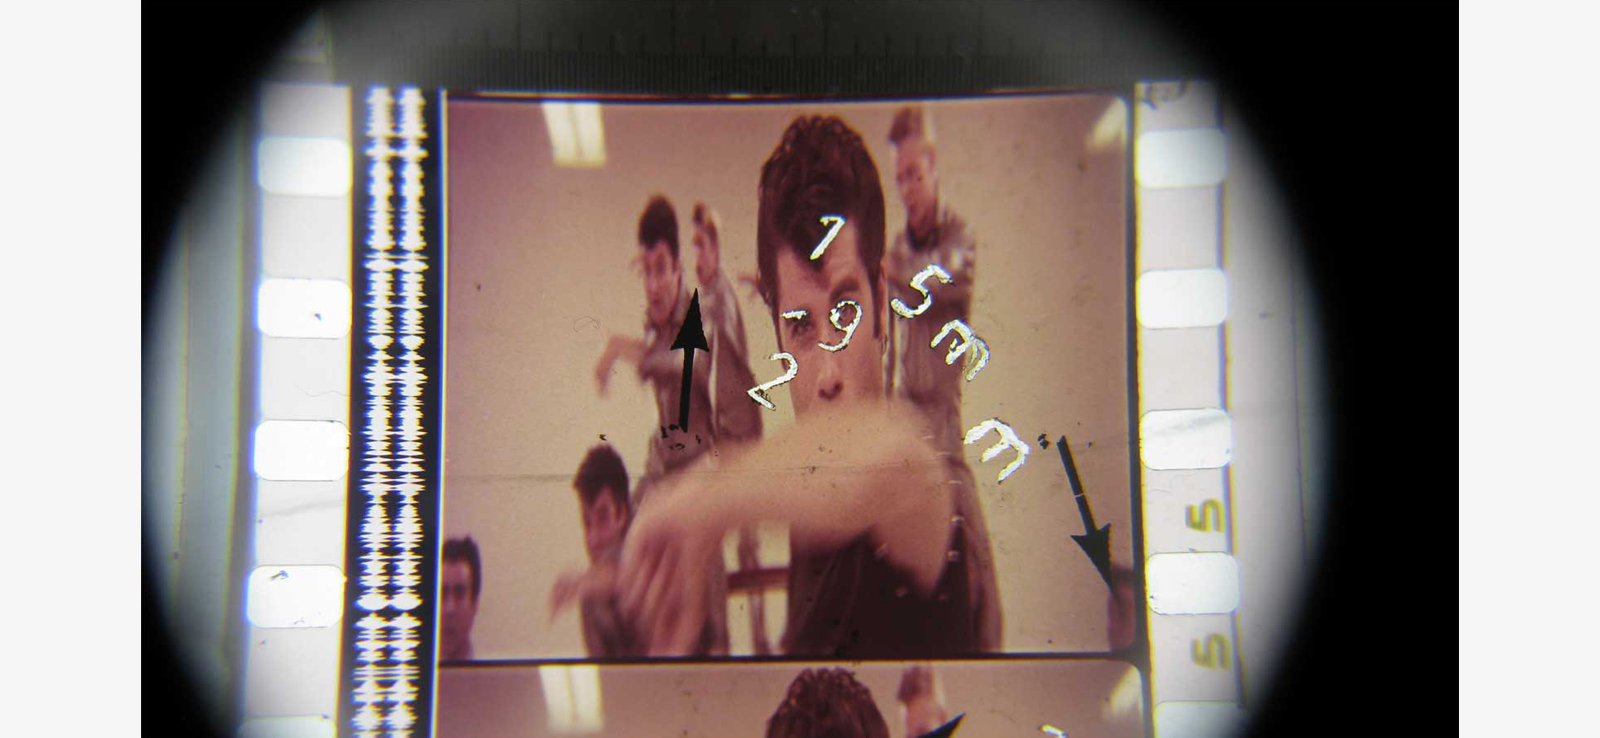 Antoni Pinent handmade film's frame from experimental animation G/R/E/A/S/E